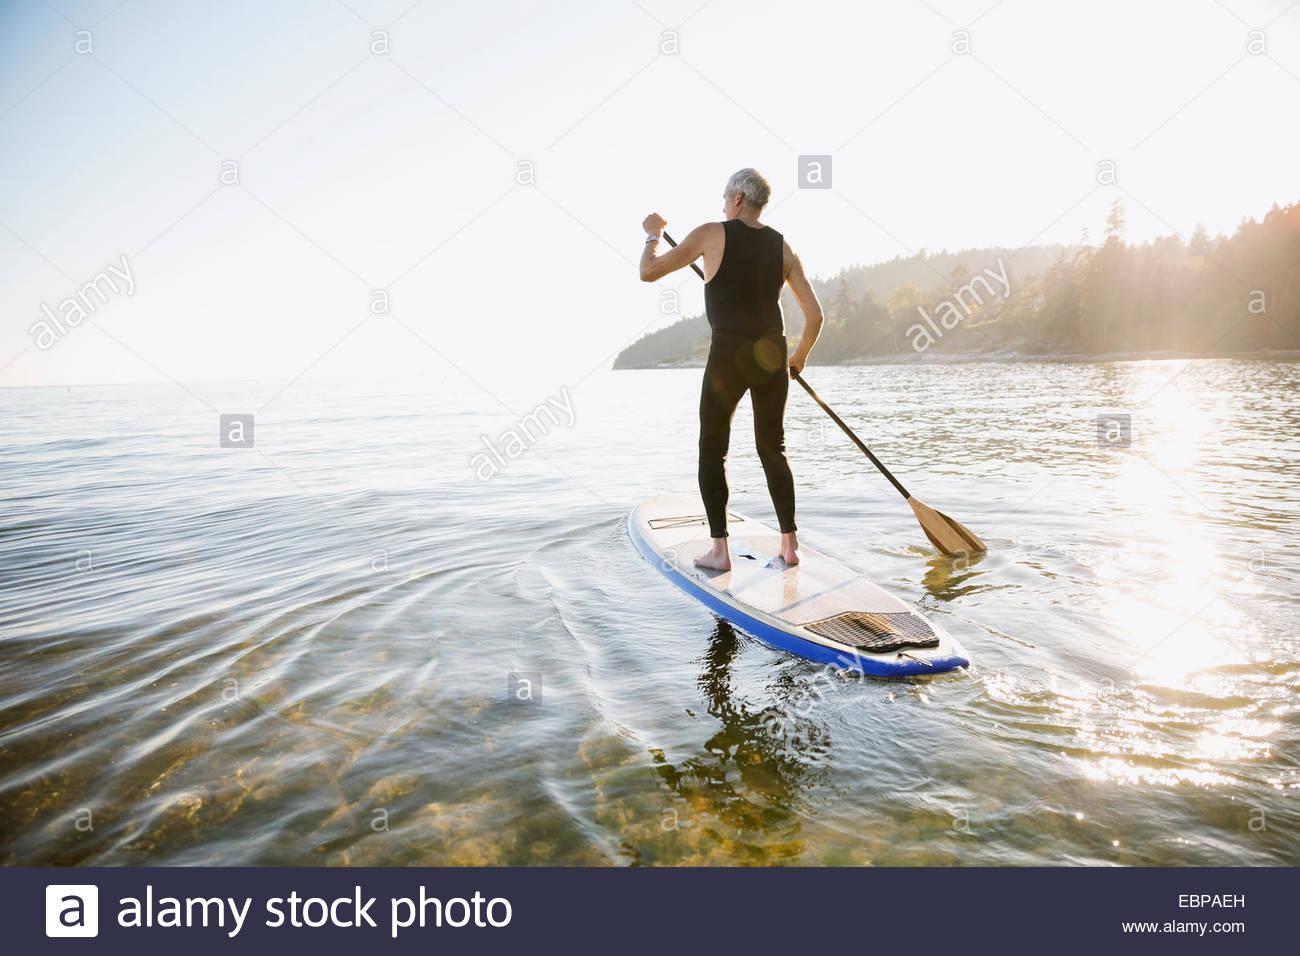 Senior man paddle boarding in ocean - Stock Image